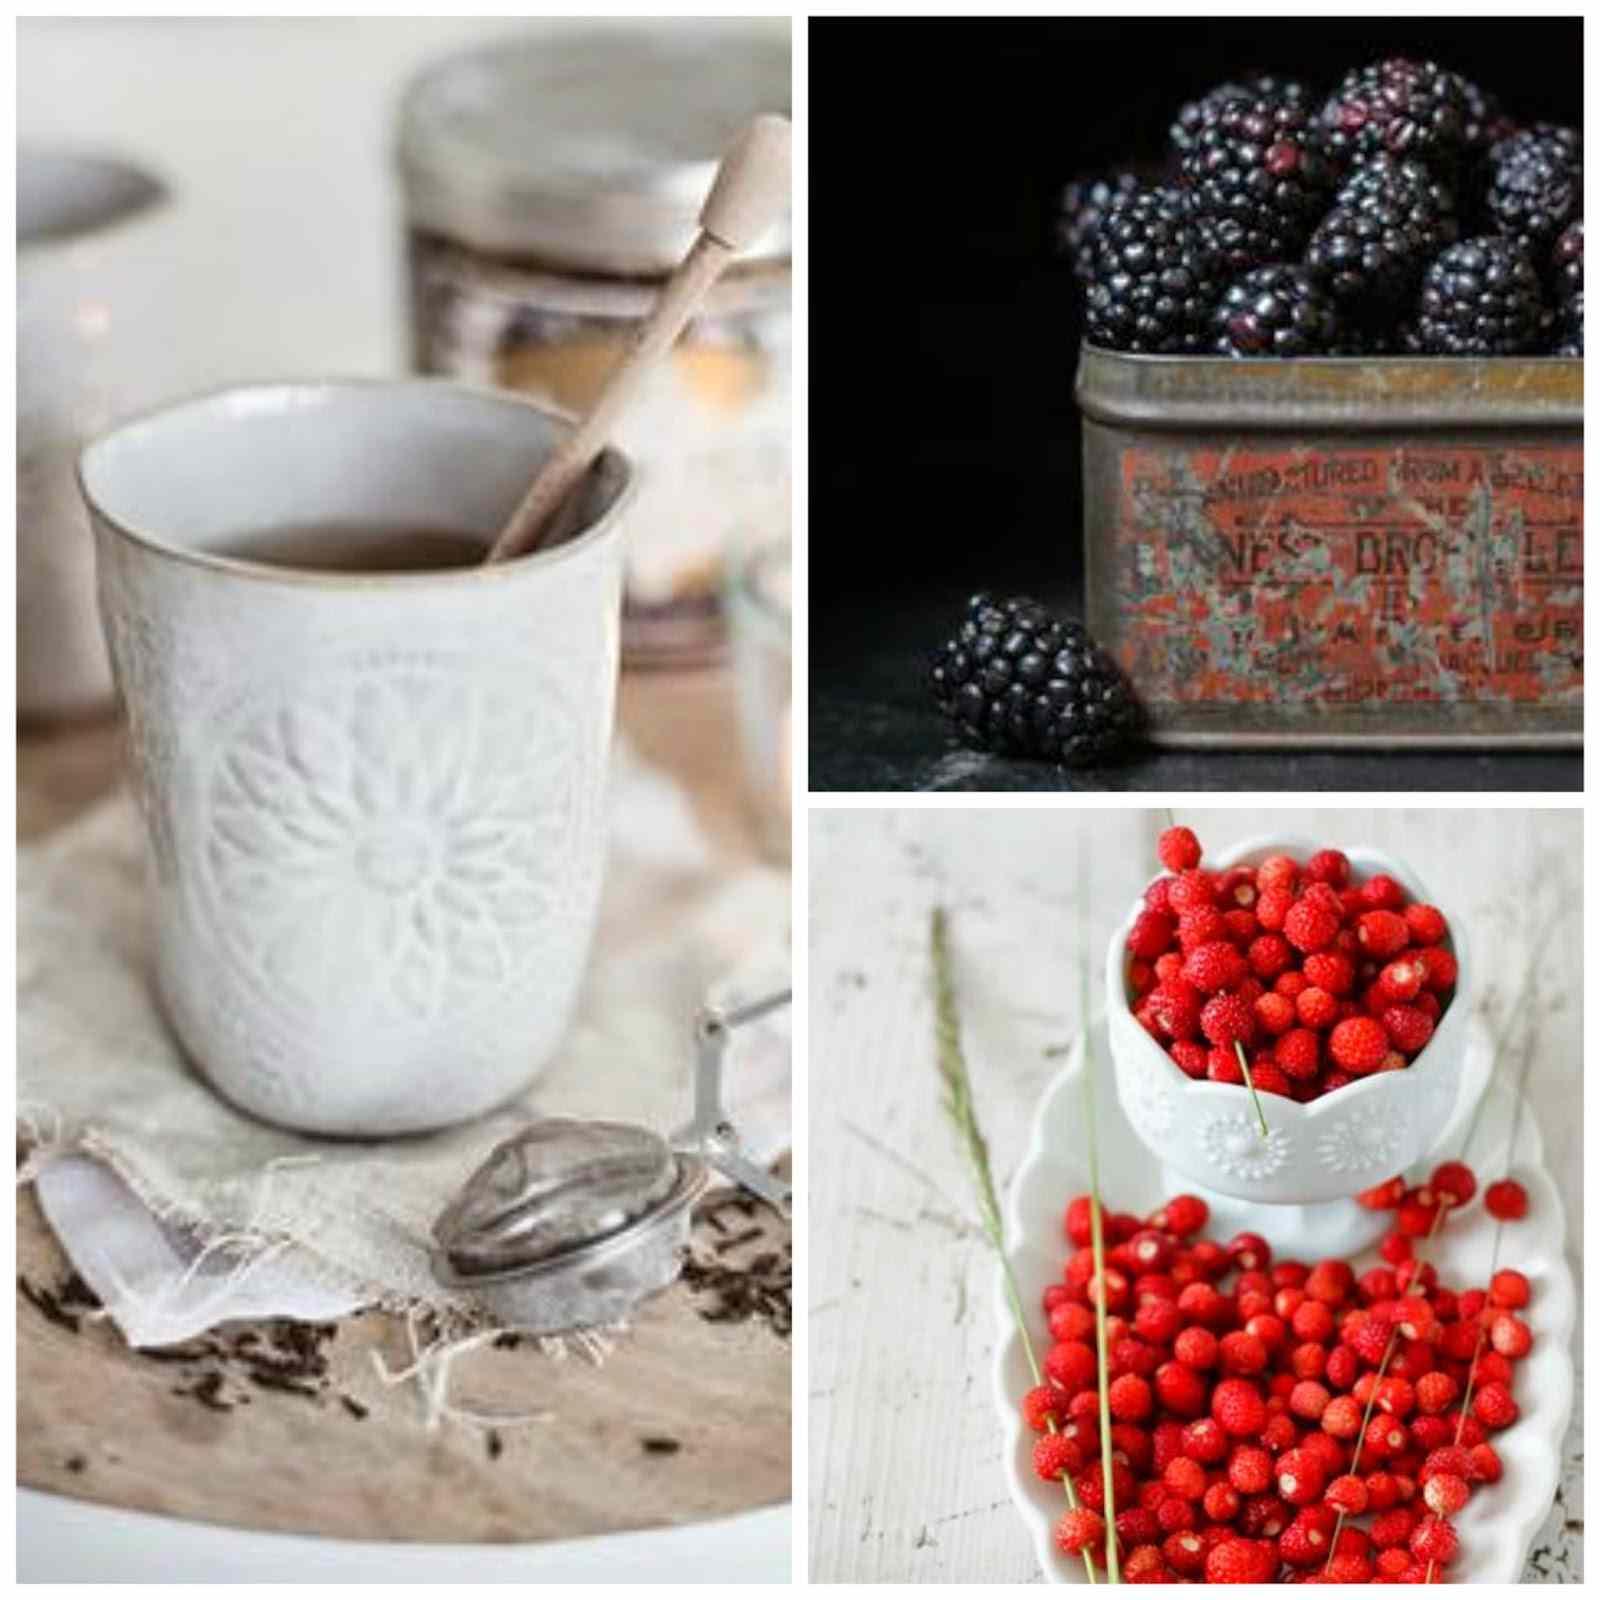 Ricetta: Tisana di uvetta, more e fragoline / herbal tea with raisins, malberries and wild strawberries